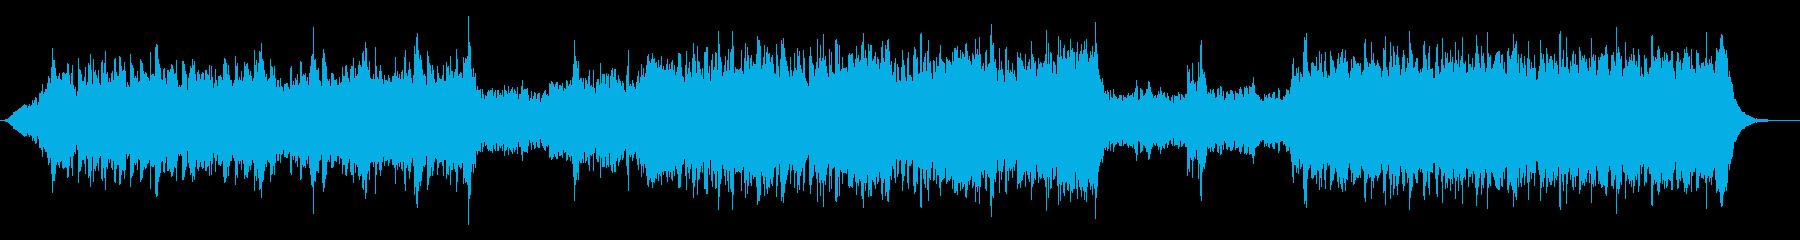 texture18の再生済みの波形